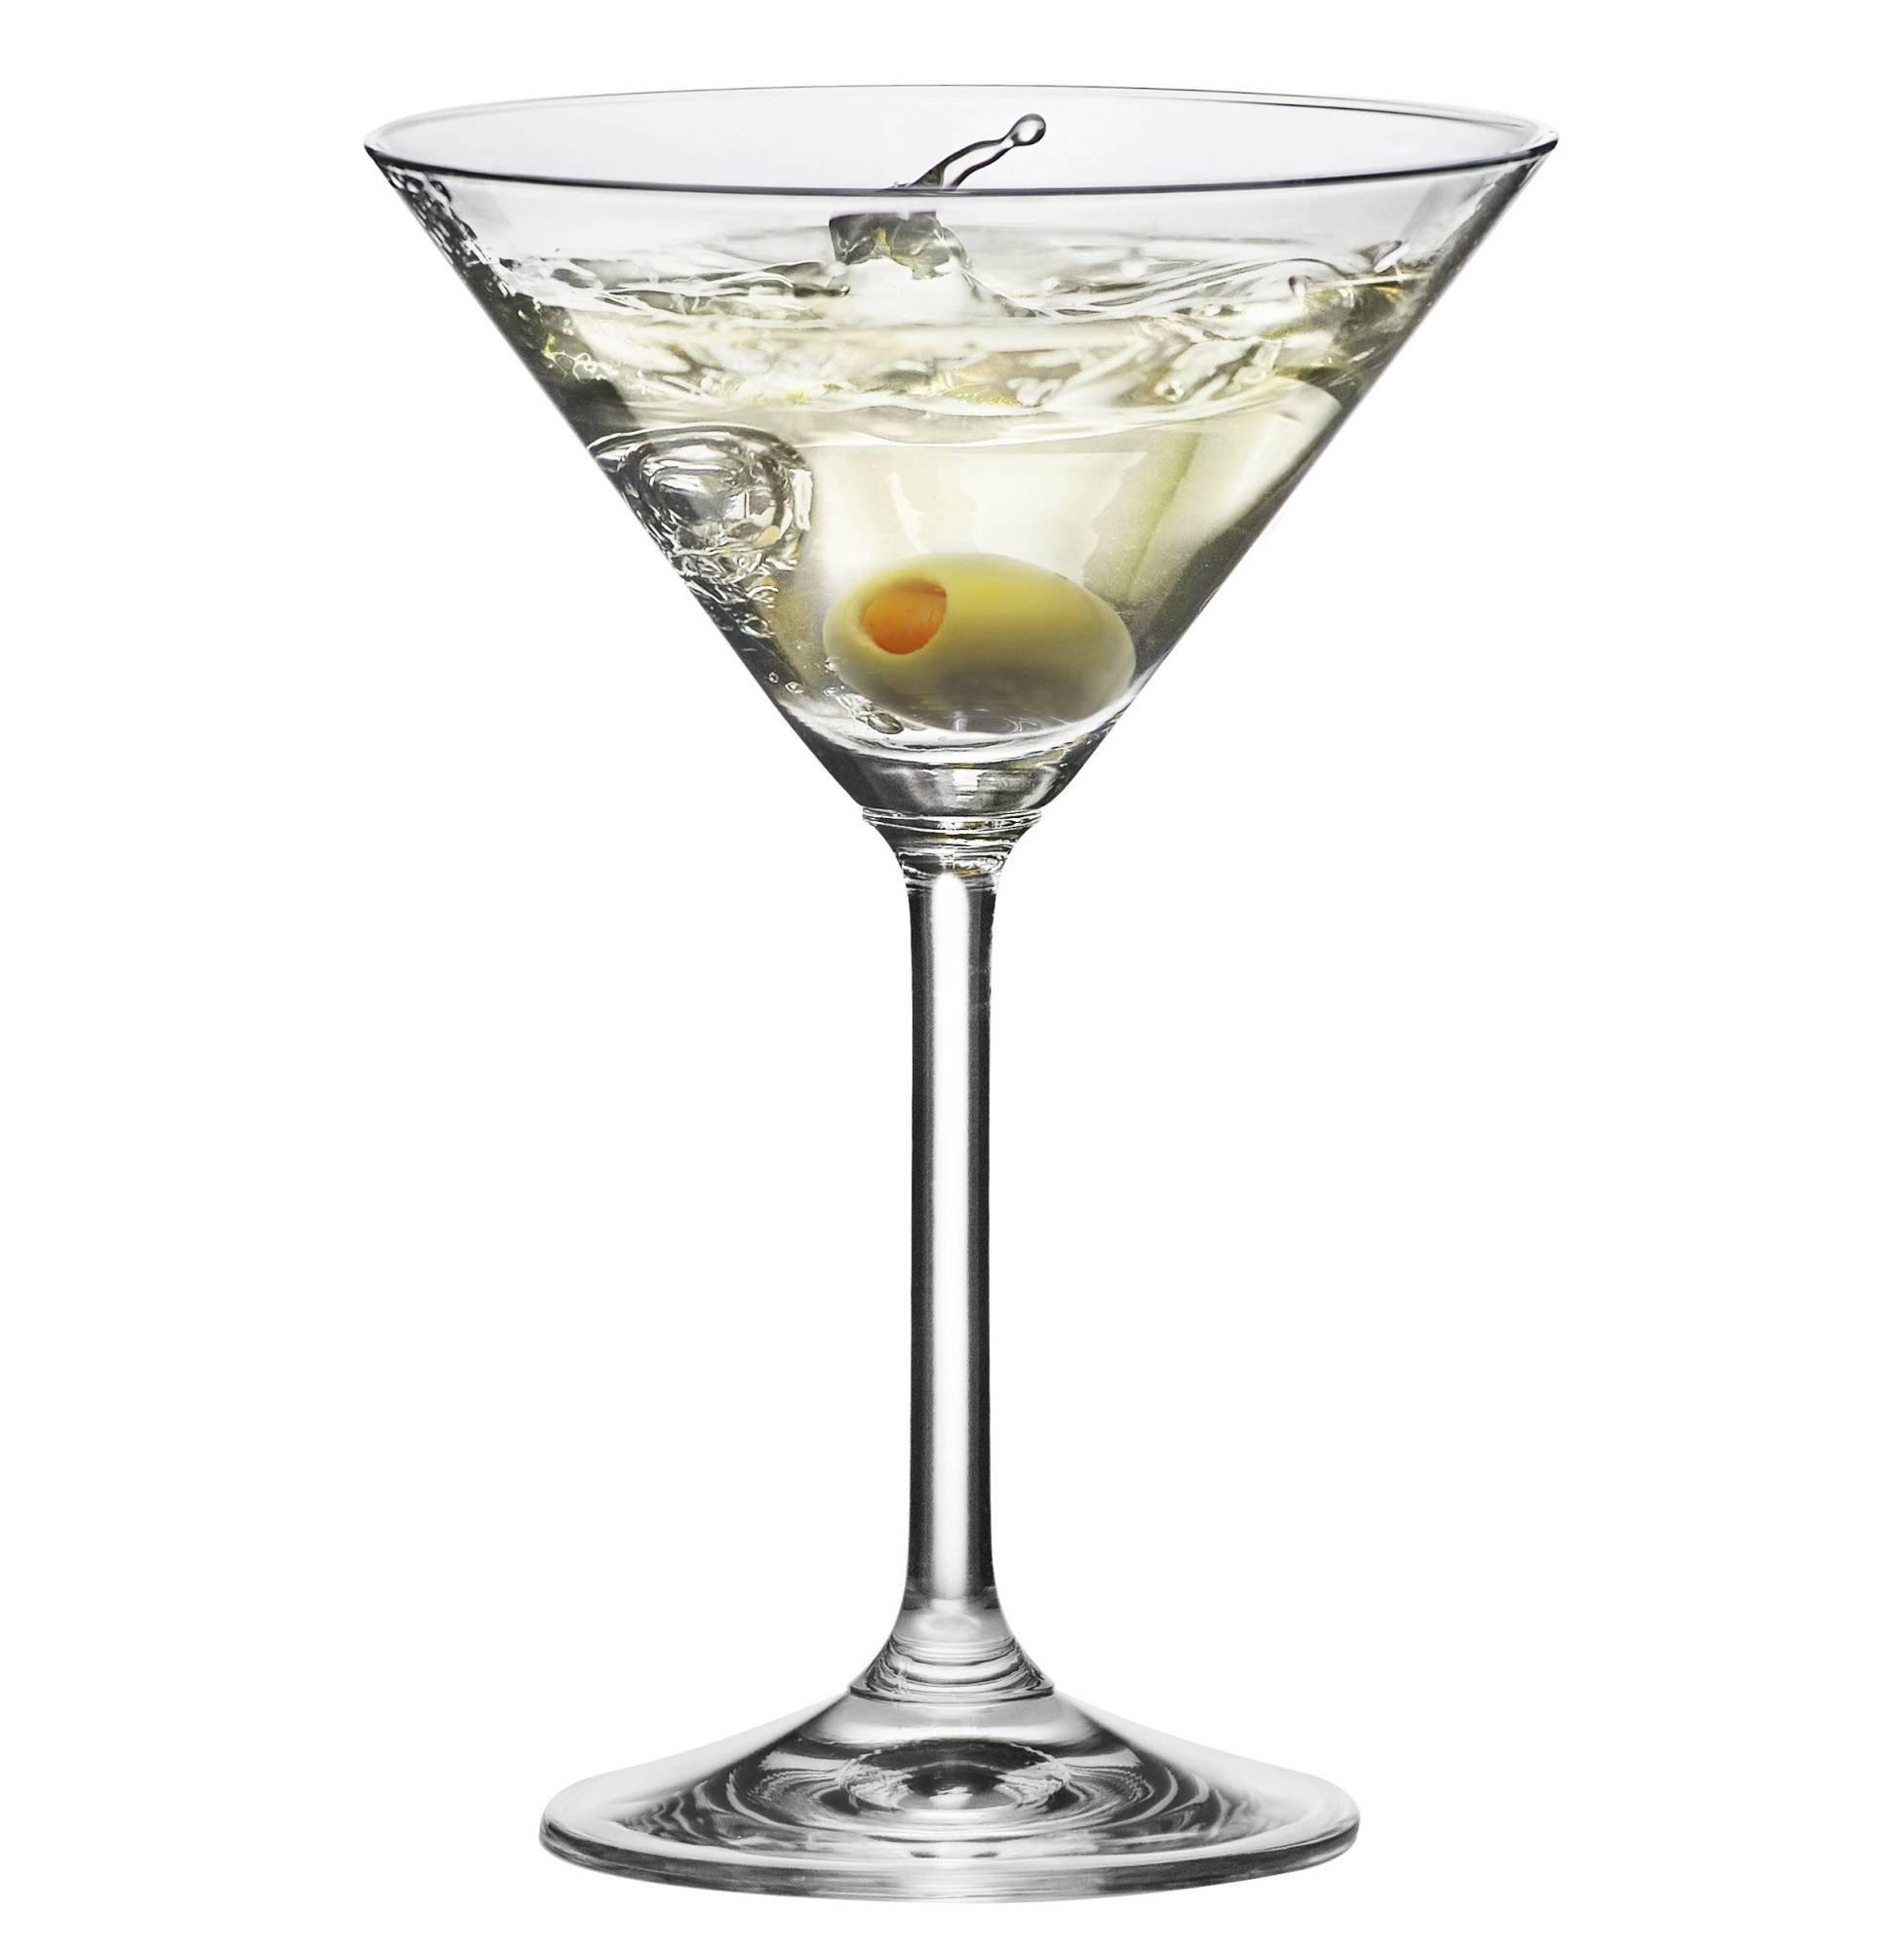 RONA RONA GALA Martini Glass 6 Oz. | Set Of 6 by RONA